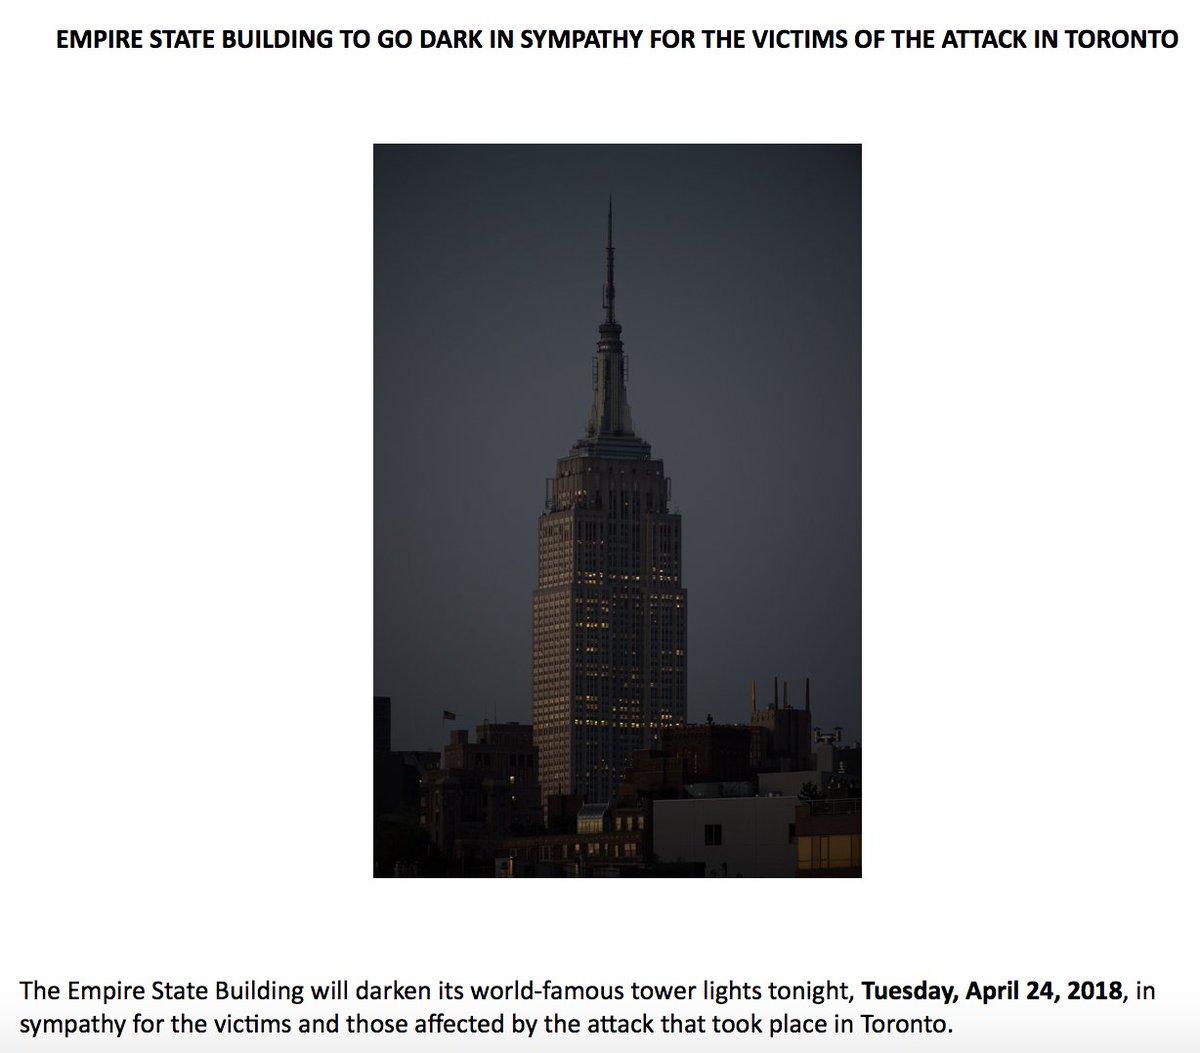 Inbox: Empire State Building will go dark tonight in honor of the victims of the Toronto van attack. https://t.co/uTxJ3kO48U